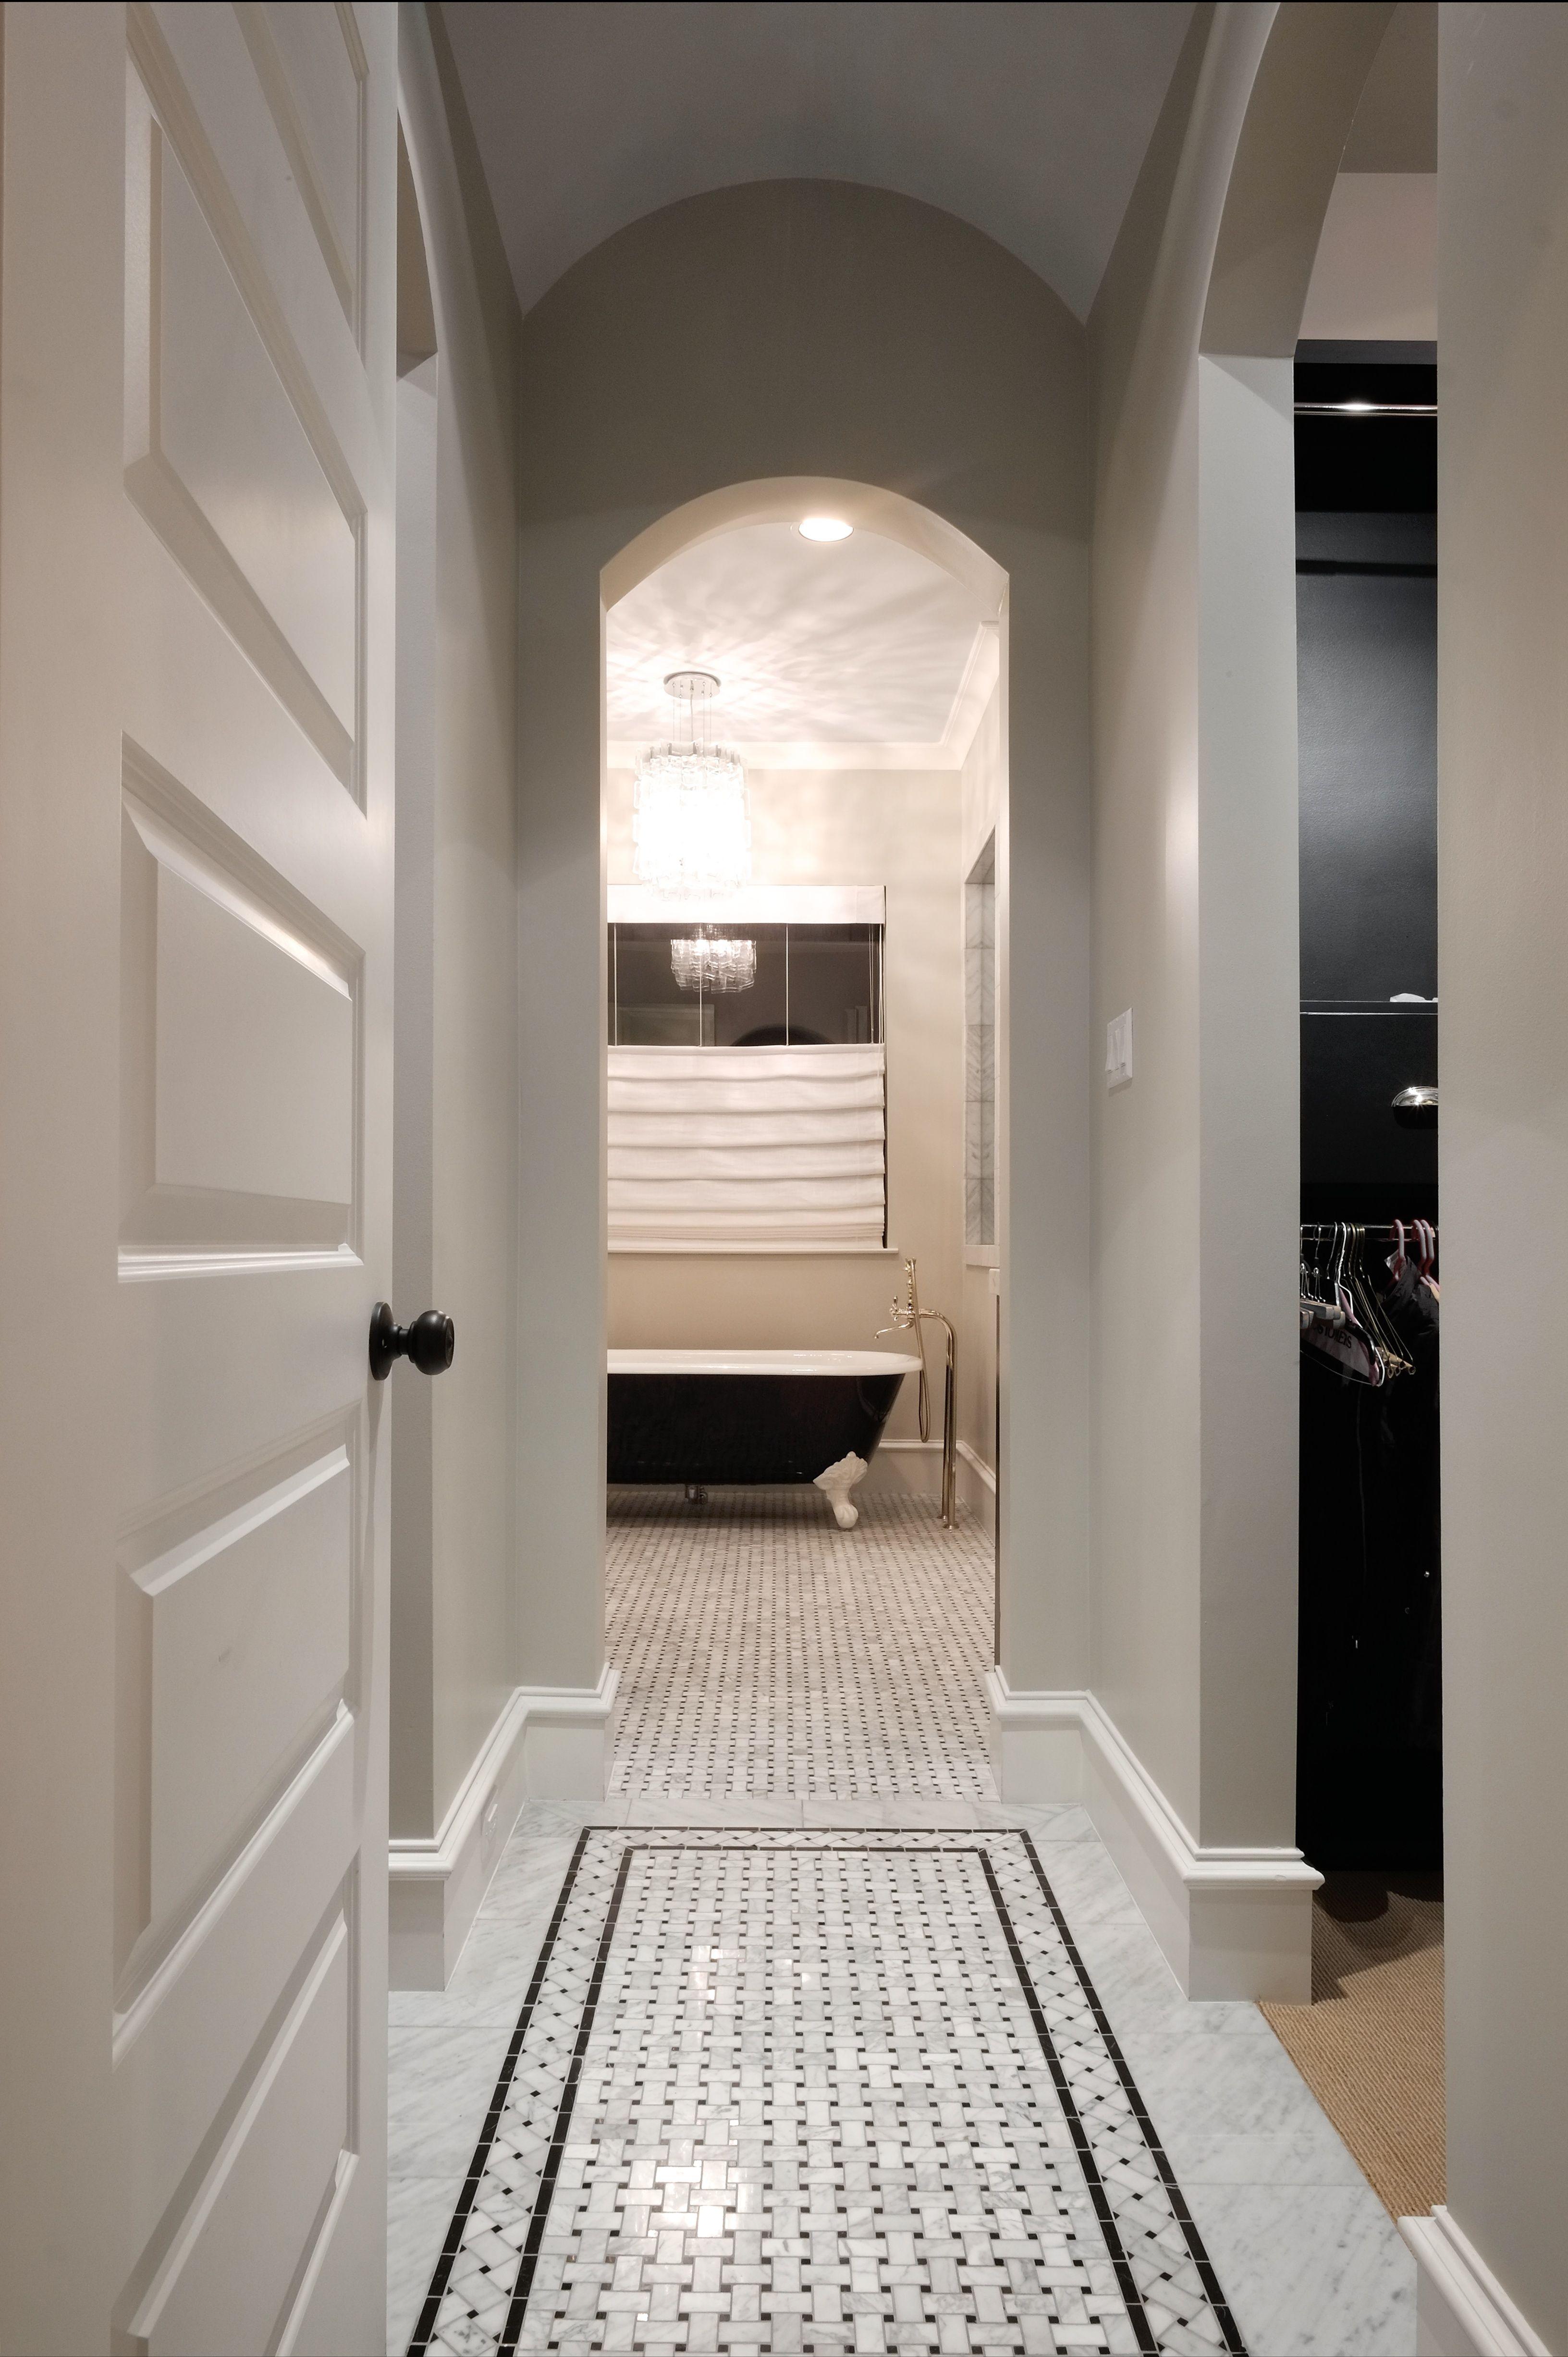 Master bedroom hallway  Master Bedroom hallway to closet u bathroom  Bathroom  Pinterest